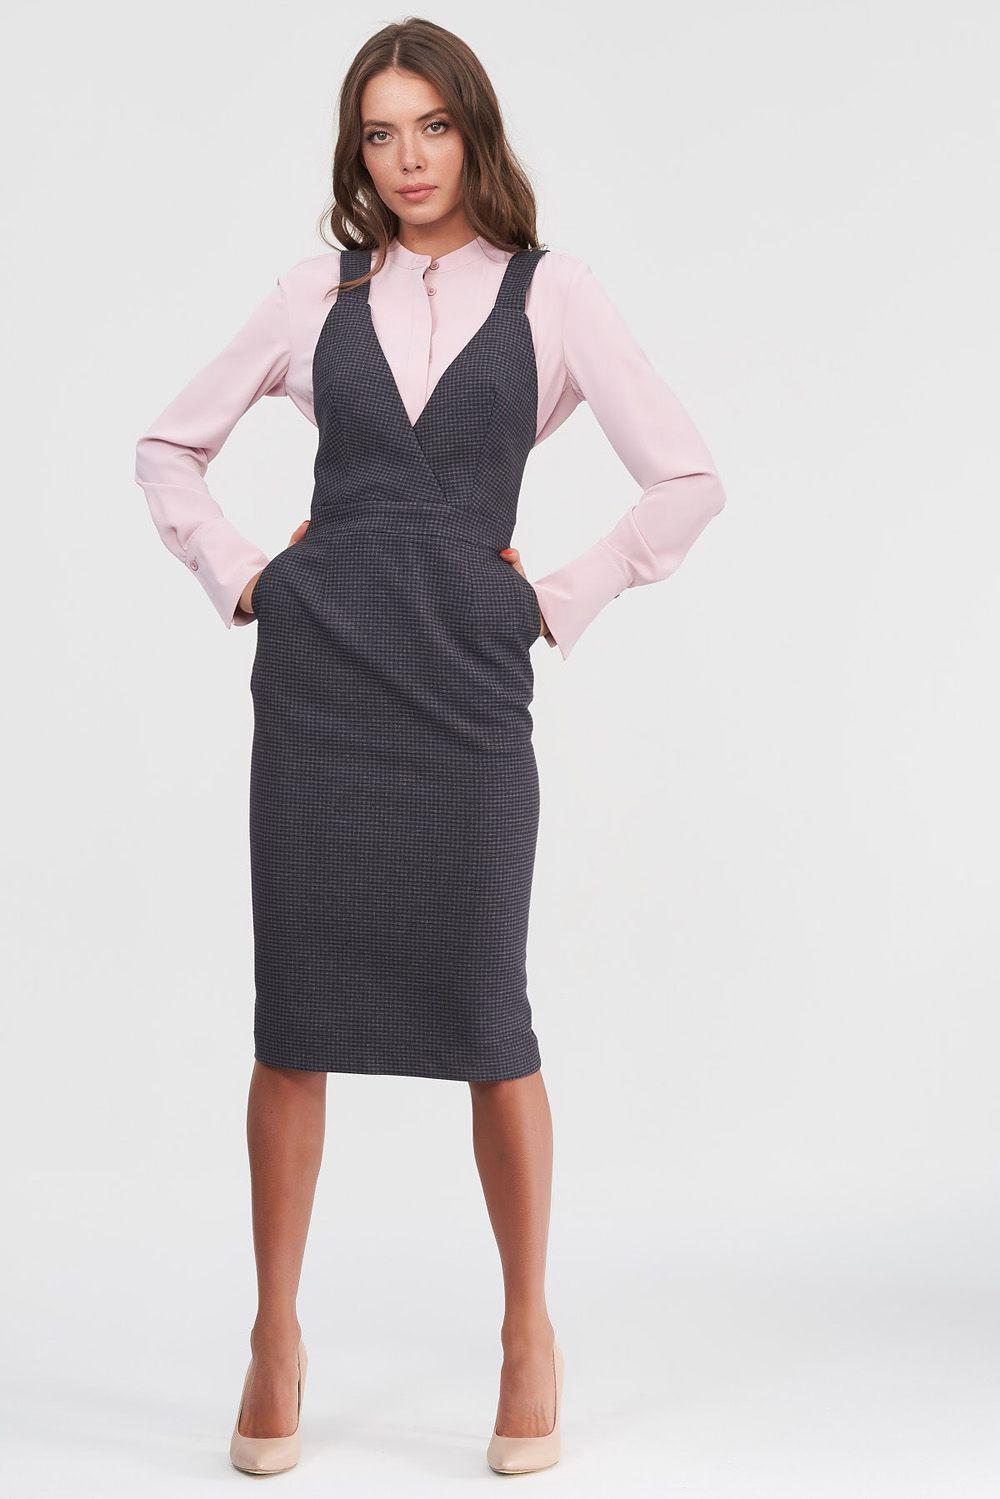 Сарафан женские Natali Bolgar модель 19028MAD293 , 2017